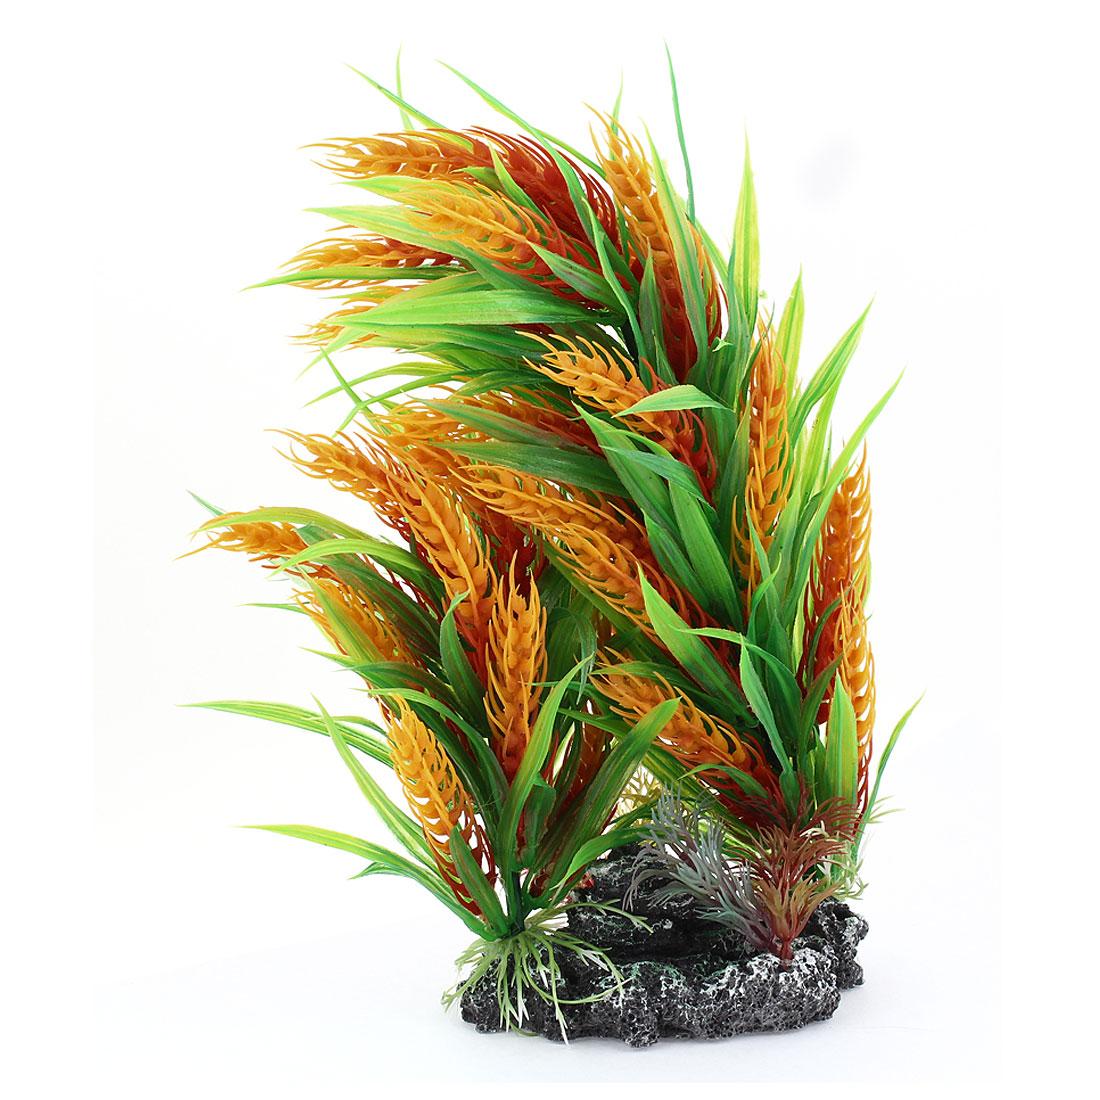 "Green Yellow Red Emulational Underwater Plant Decor 10.6"" Height for Aquarium"